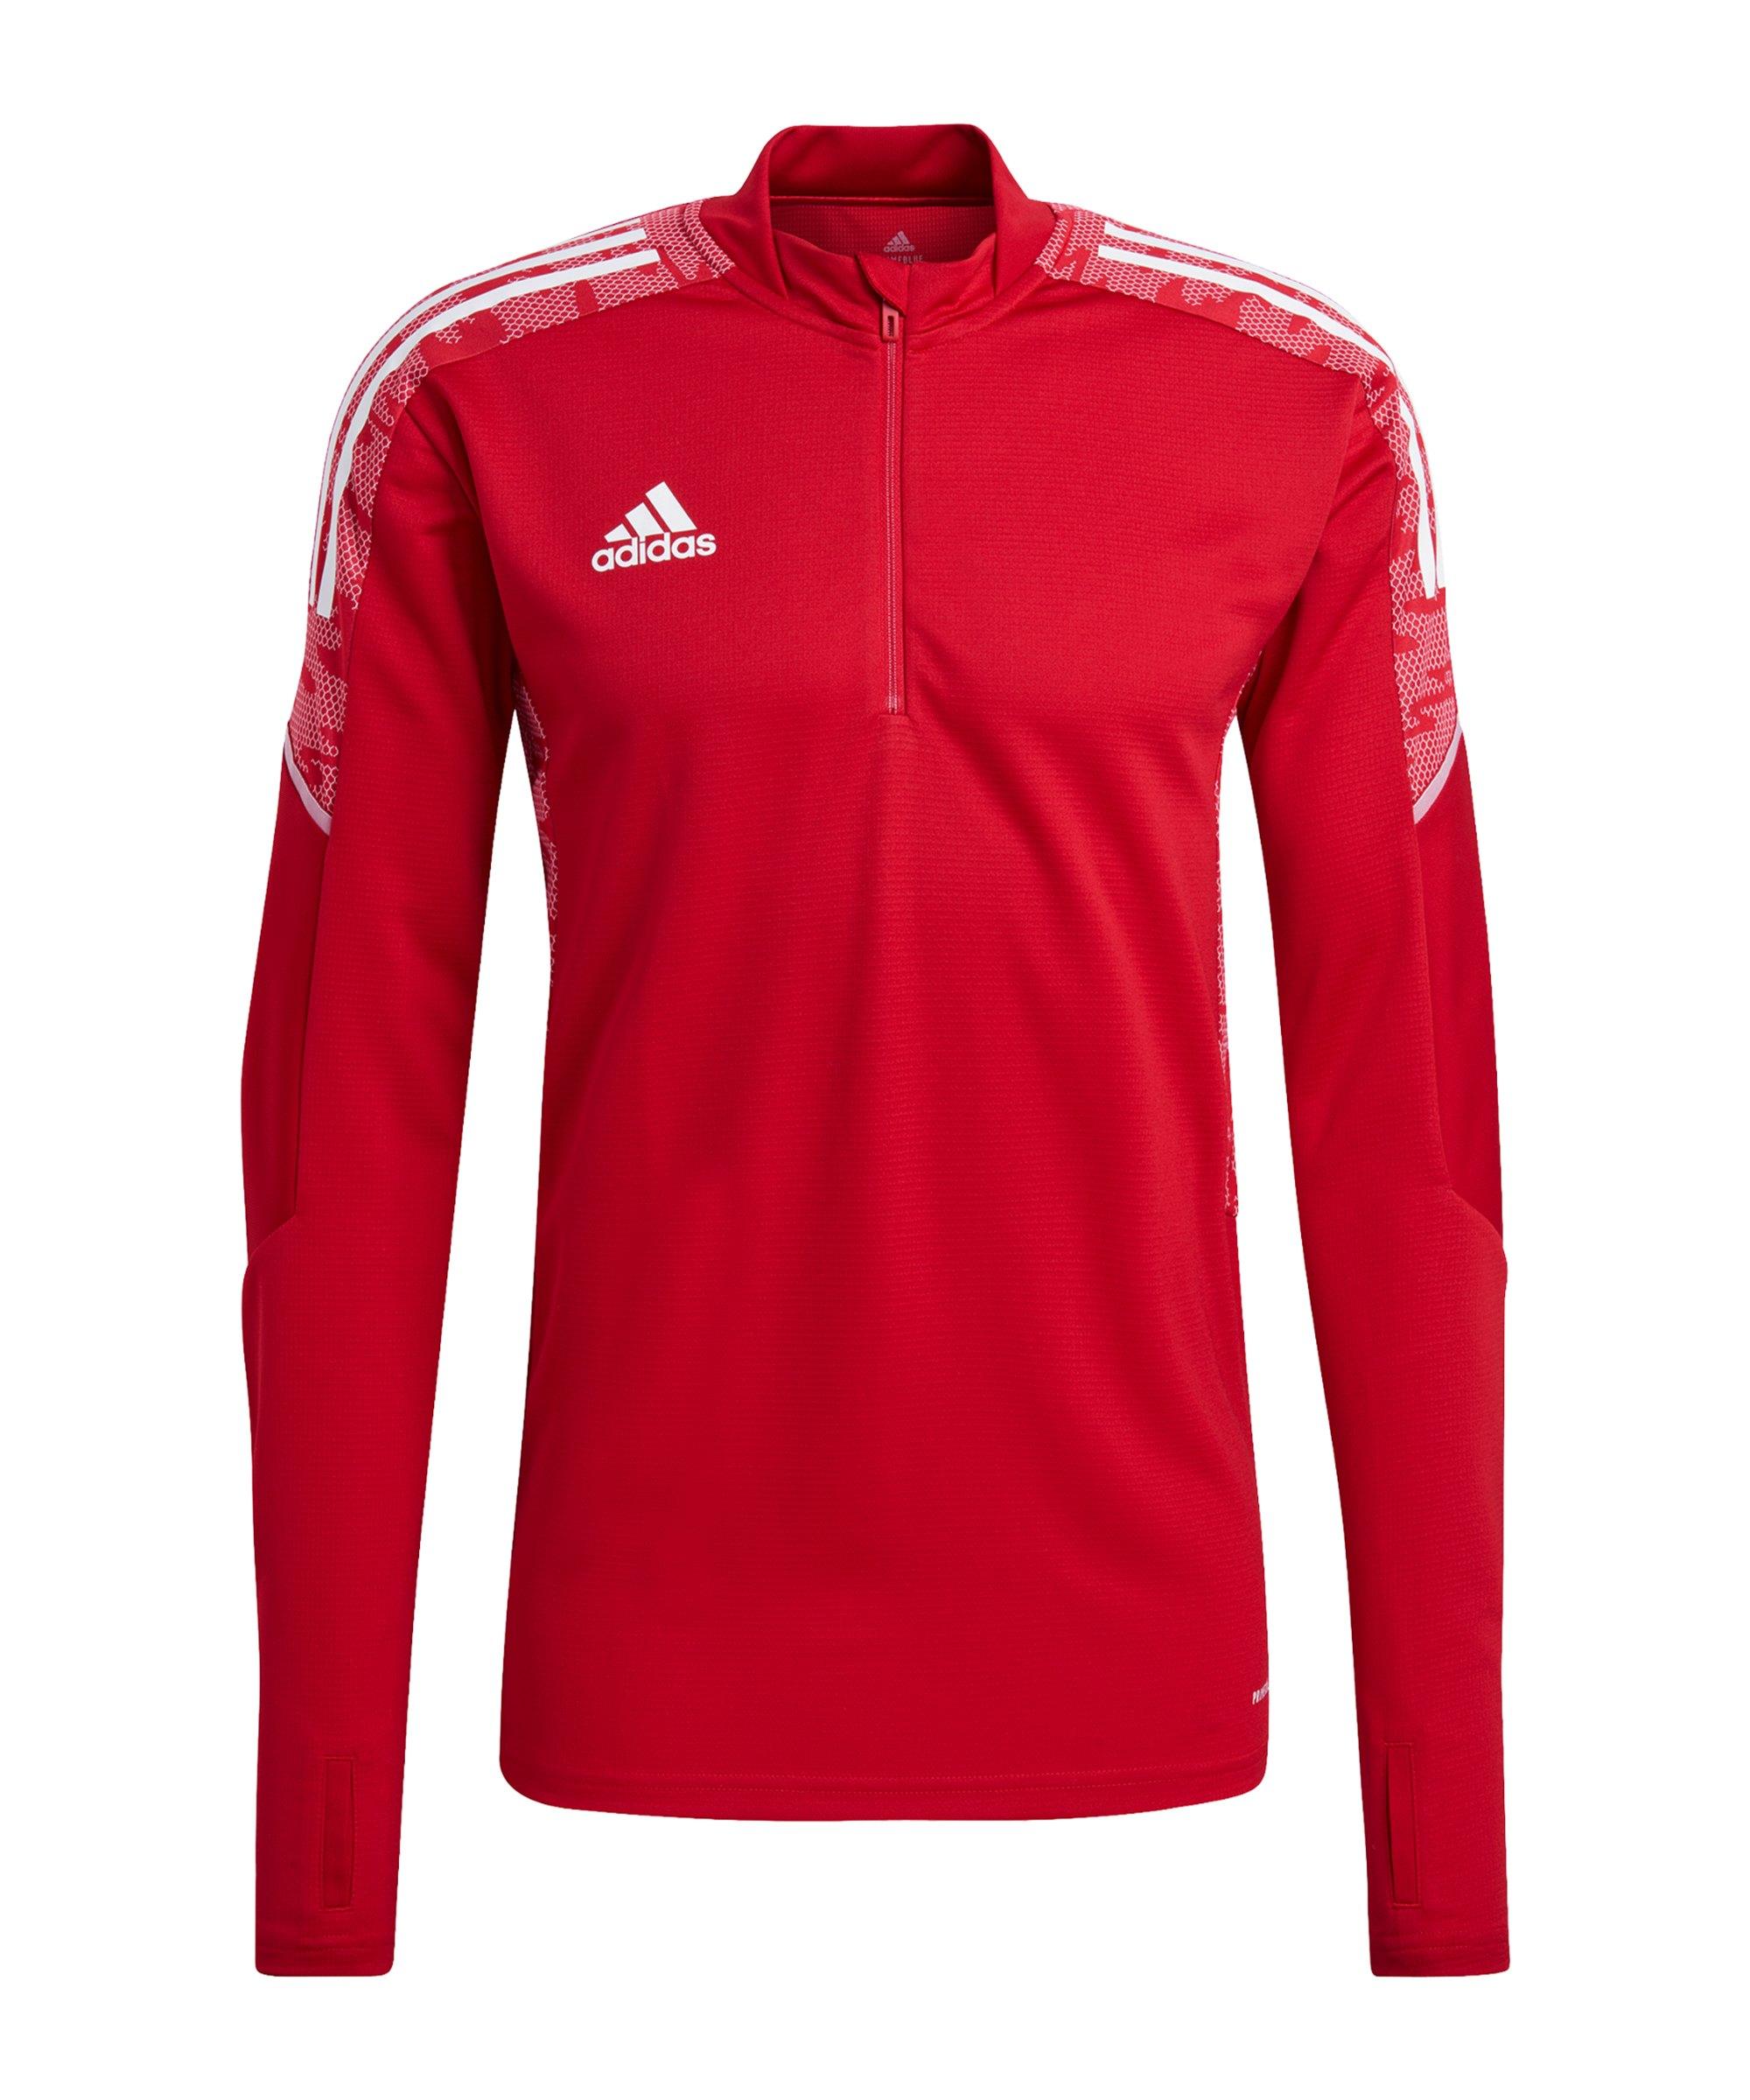 adidas Condivo 21 Trainingstop Rot Weiss - rot